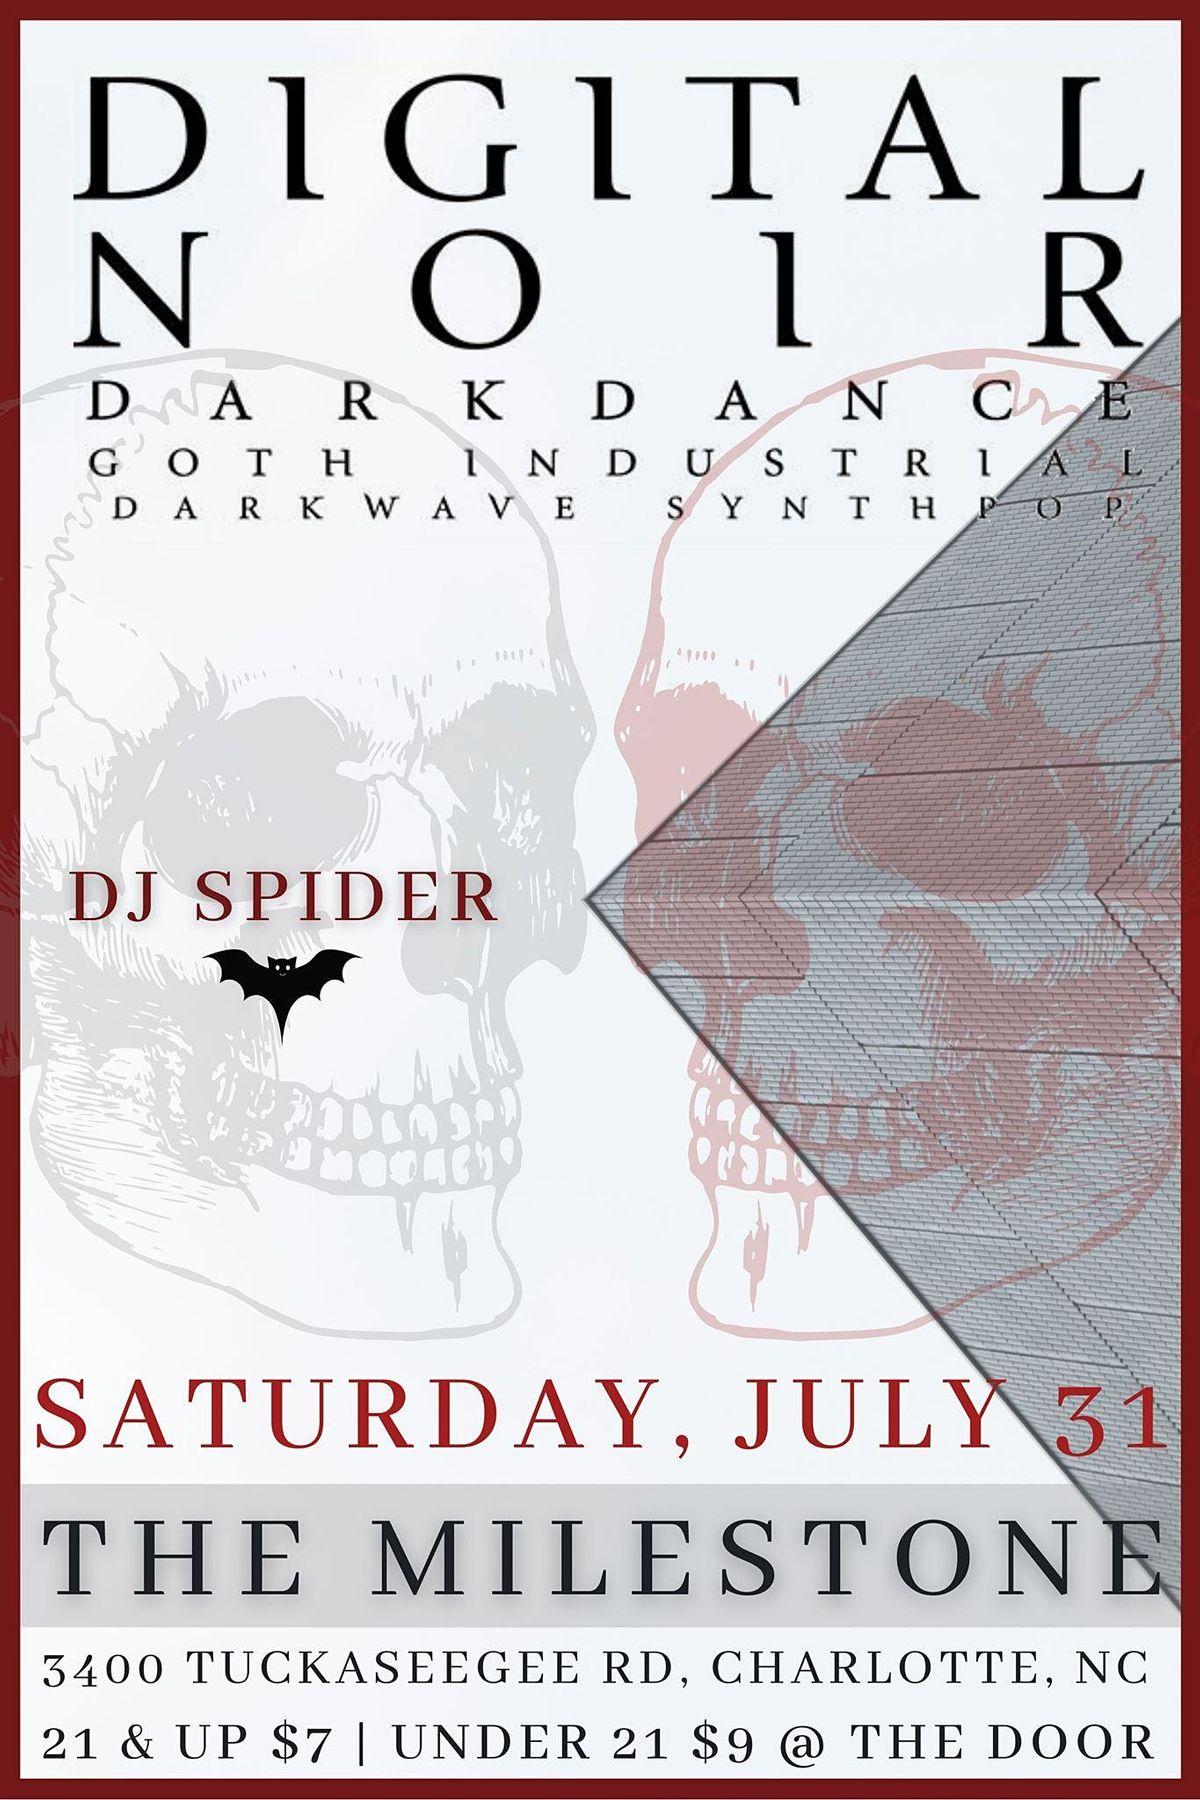 DIGITAL NOIR w\/ DJ SPIDER at The Milestone Club on Saturday July 31st 2021